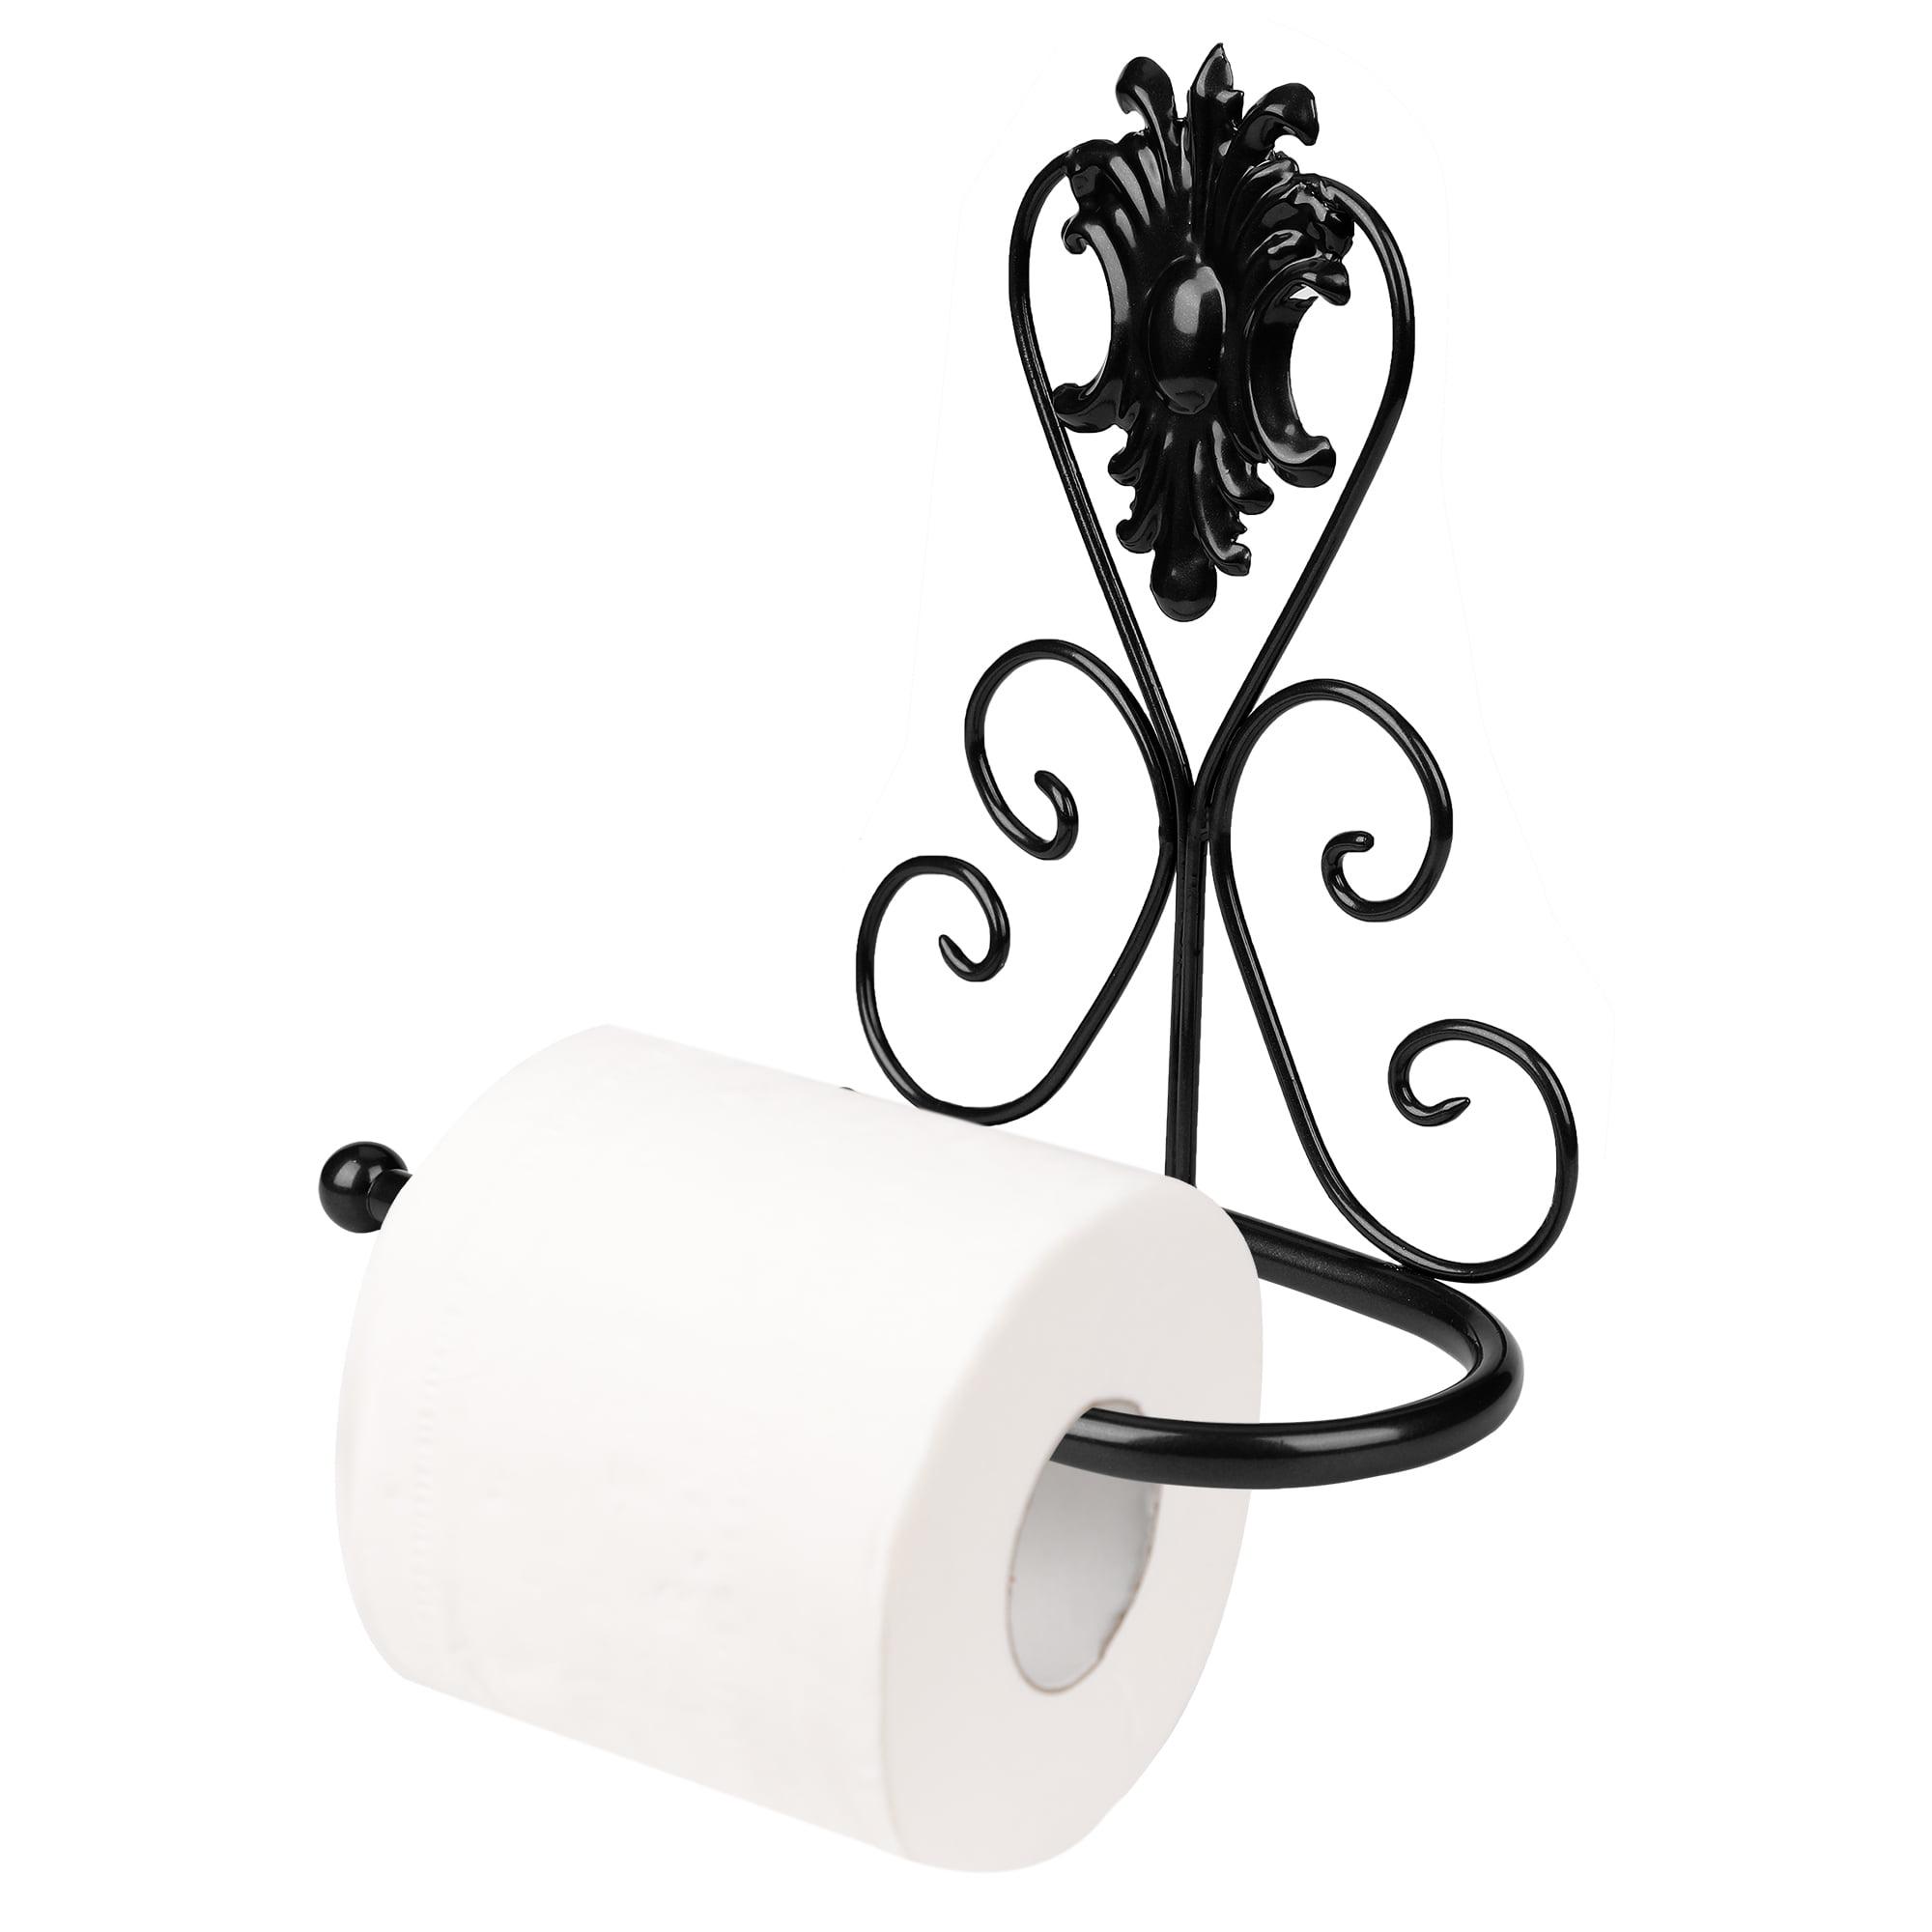 Details about  /Vintage  Iron Toilet Paper Towel Roll Holder Bathroom Wall Mount RacK/_sh Jx